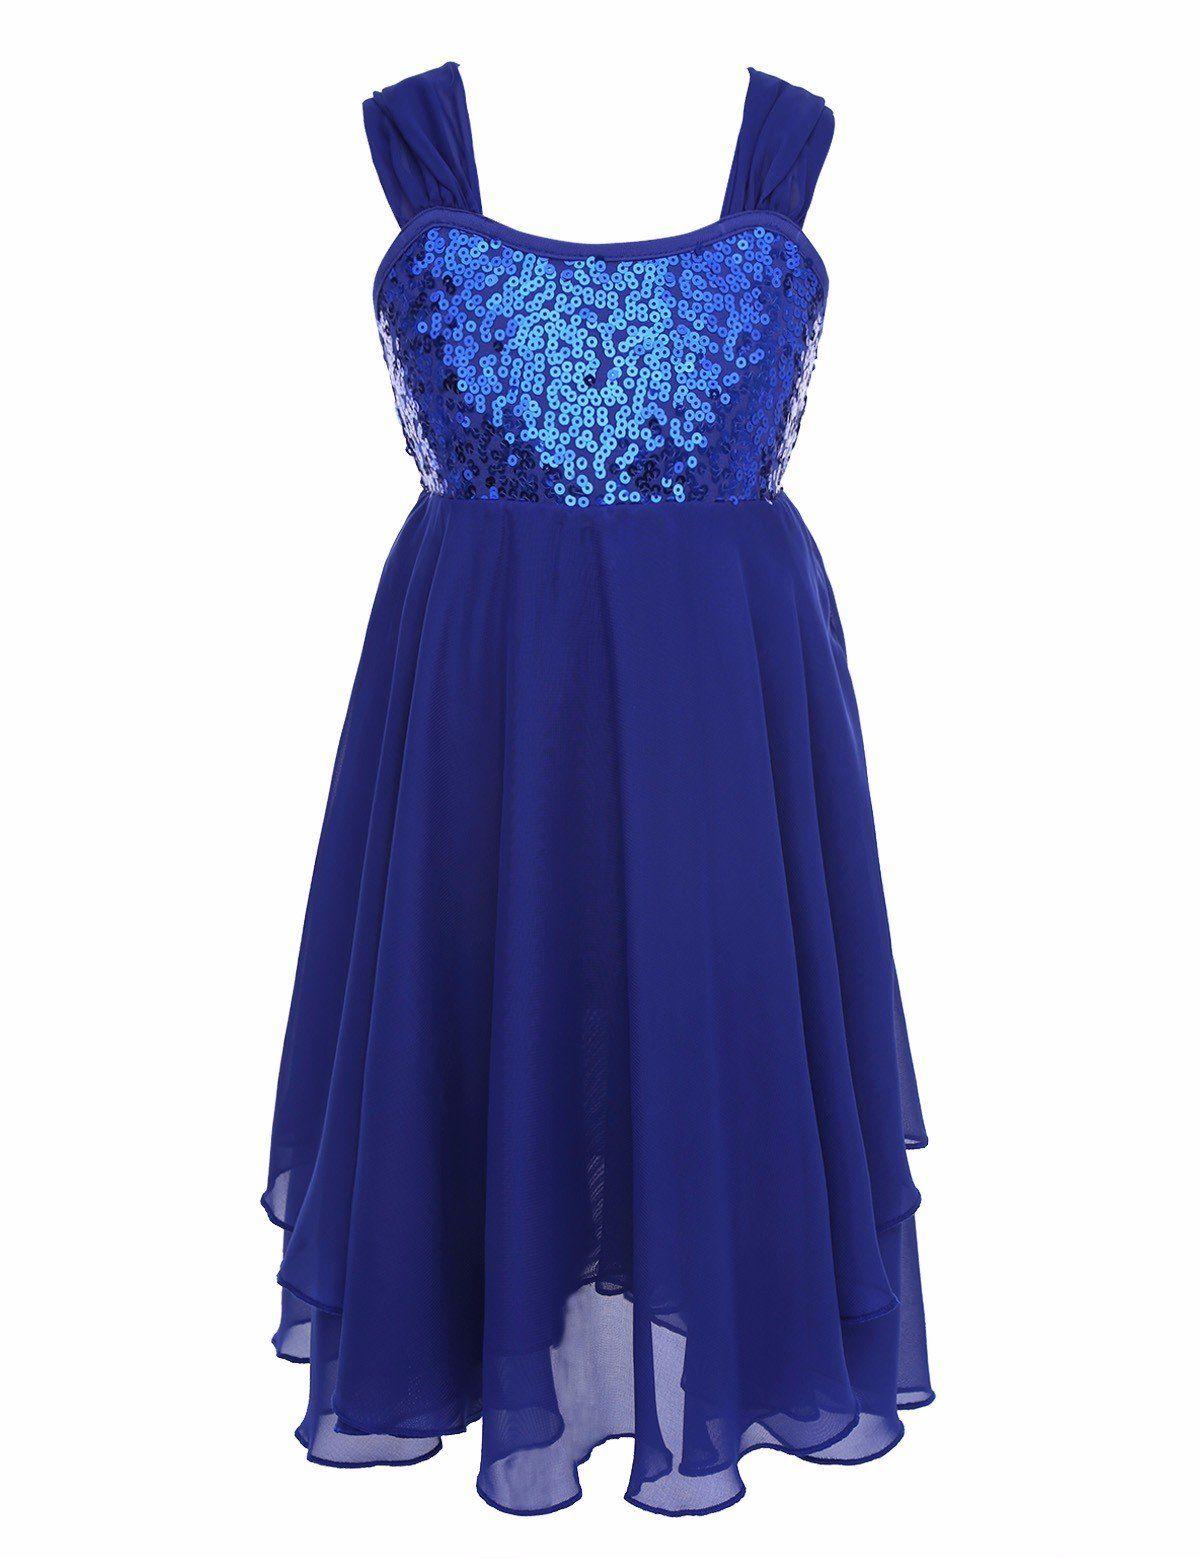 Details about  /Kids Girls Ballet Dress Leotard Skirt Latin Lyrical Dancer Gymnastic Costume